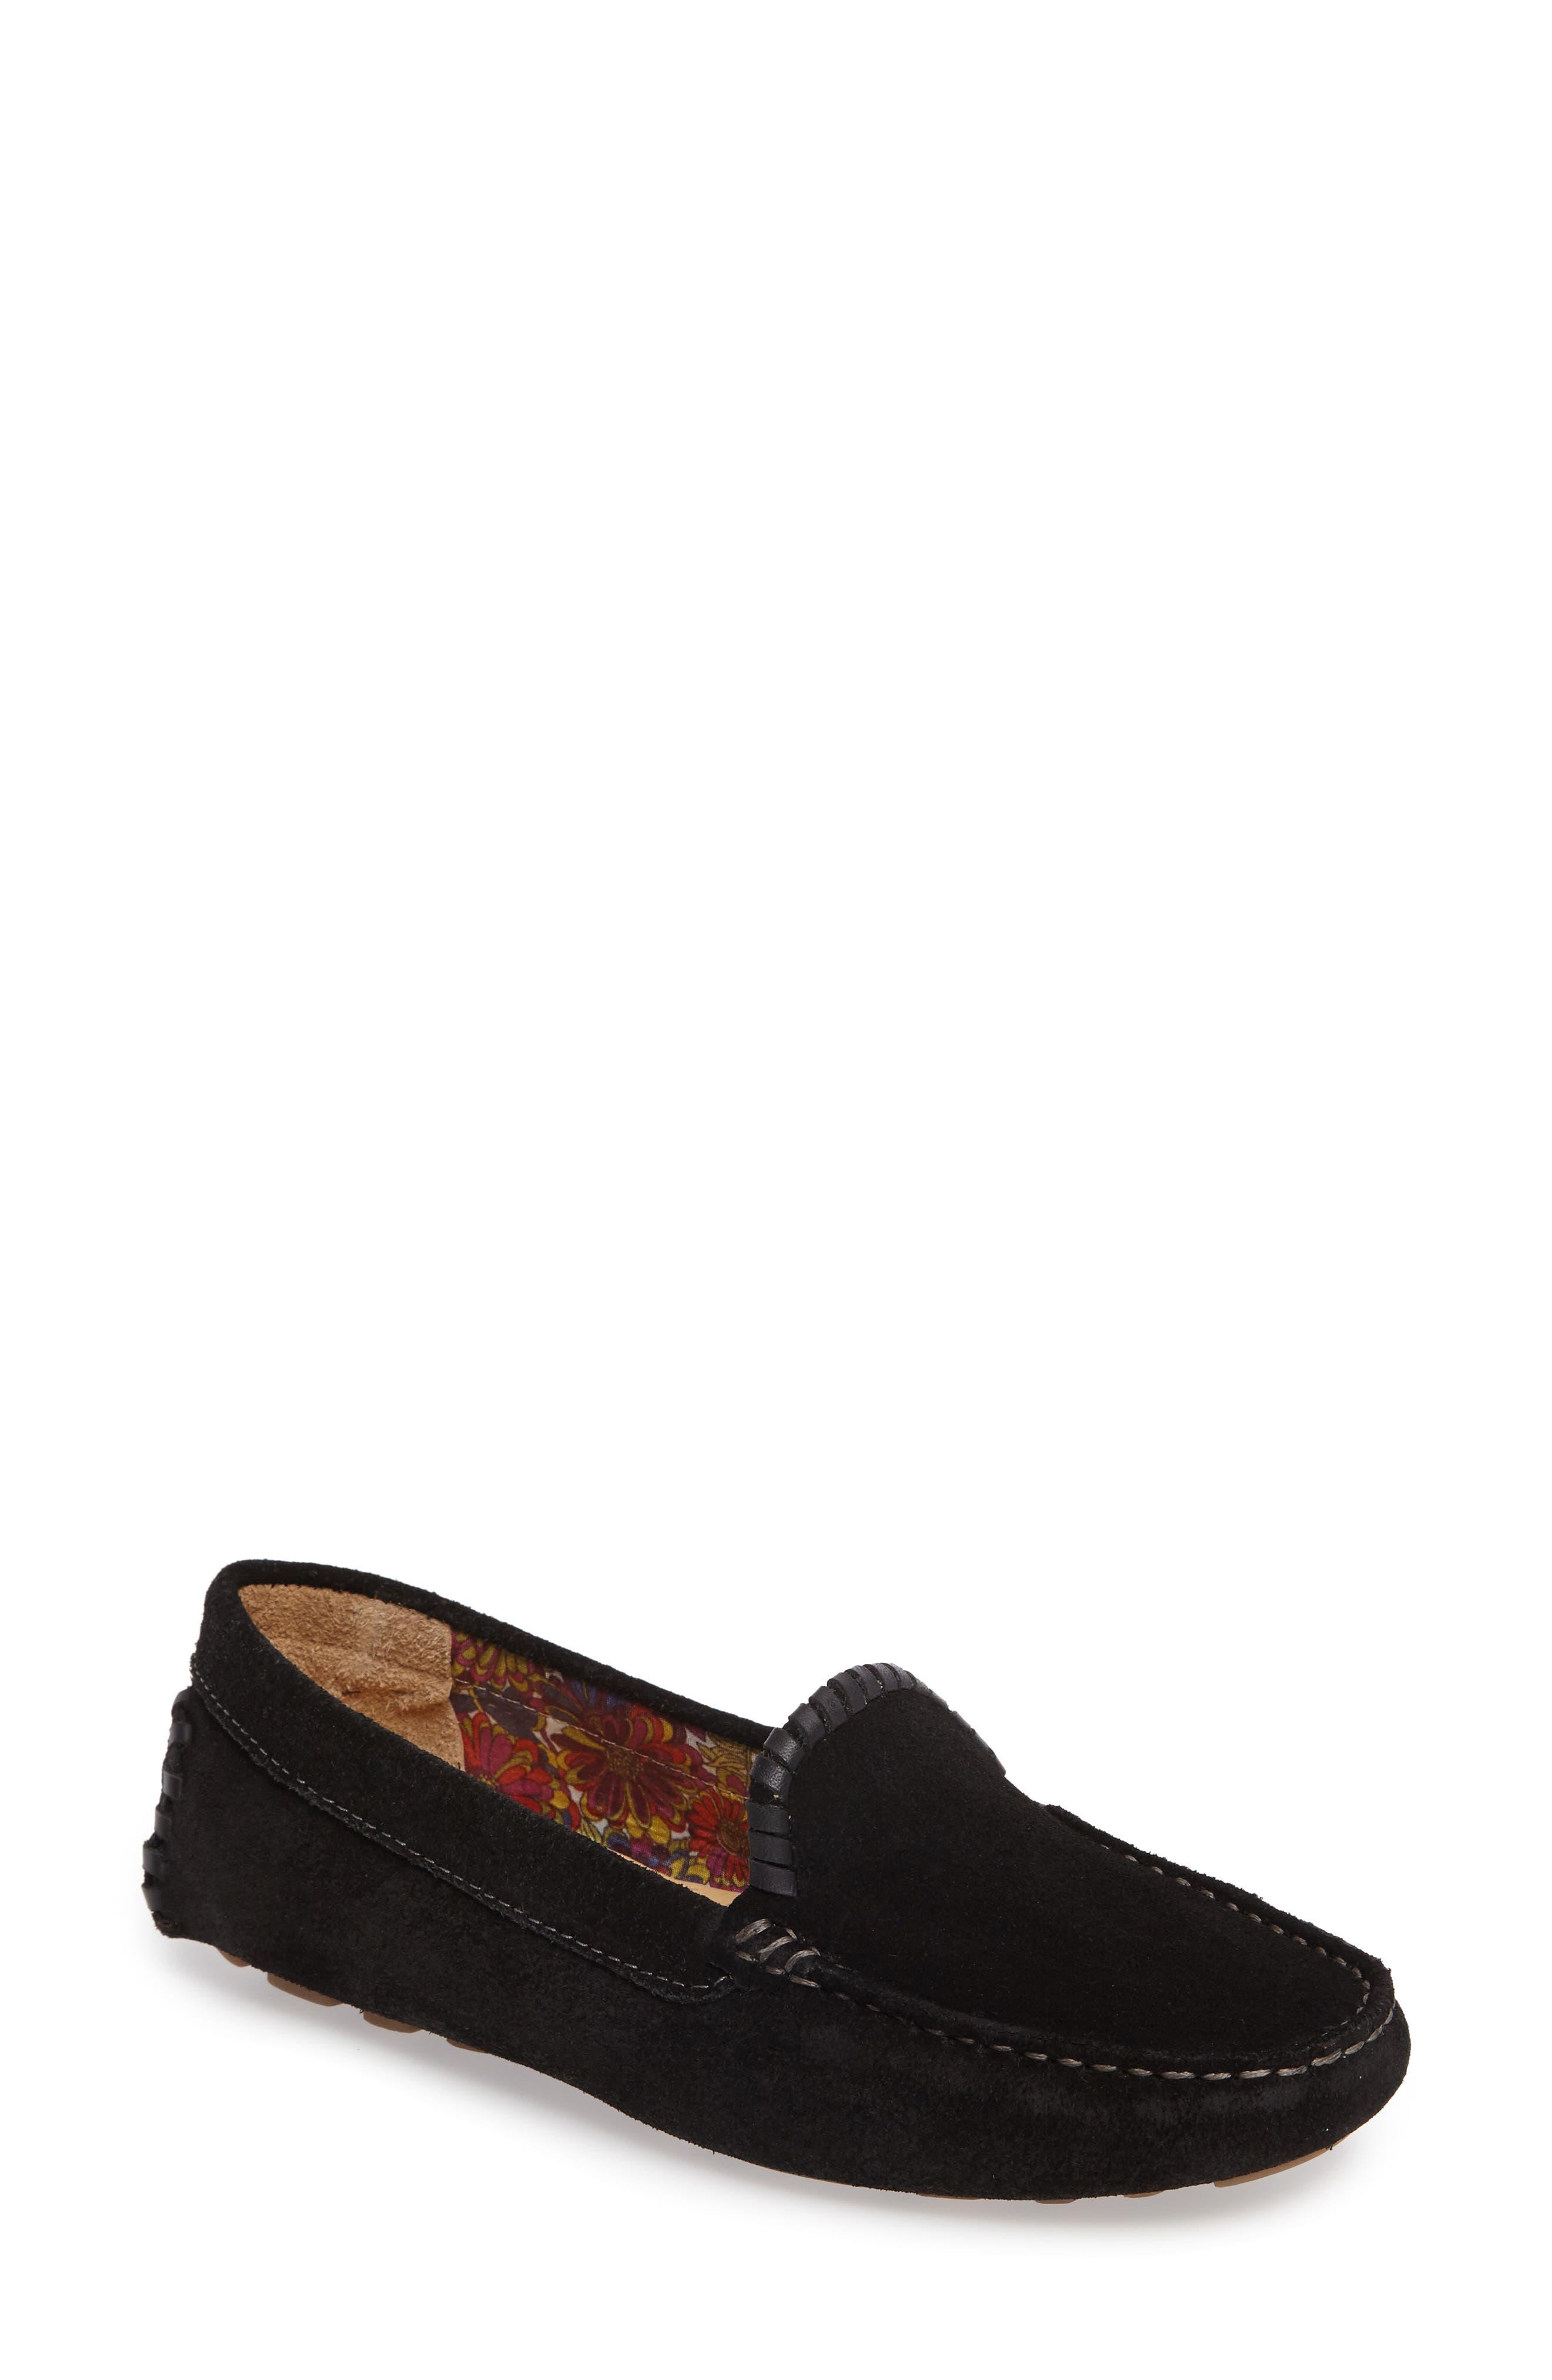 Taylor Driving Loafer,                         Main,                         color, BLACK SUEDE